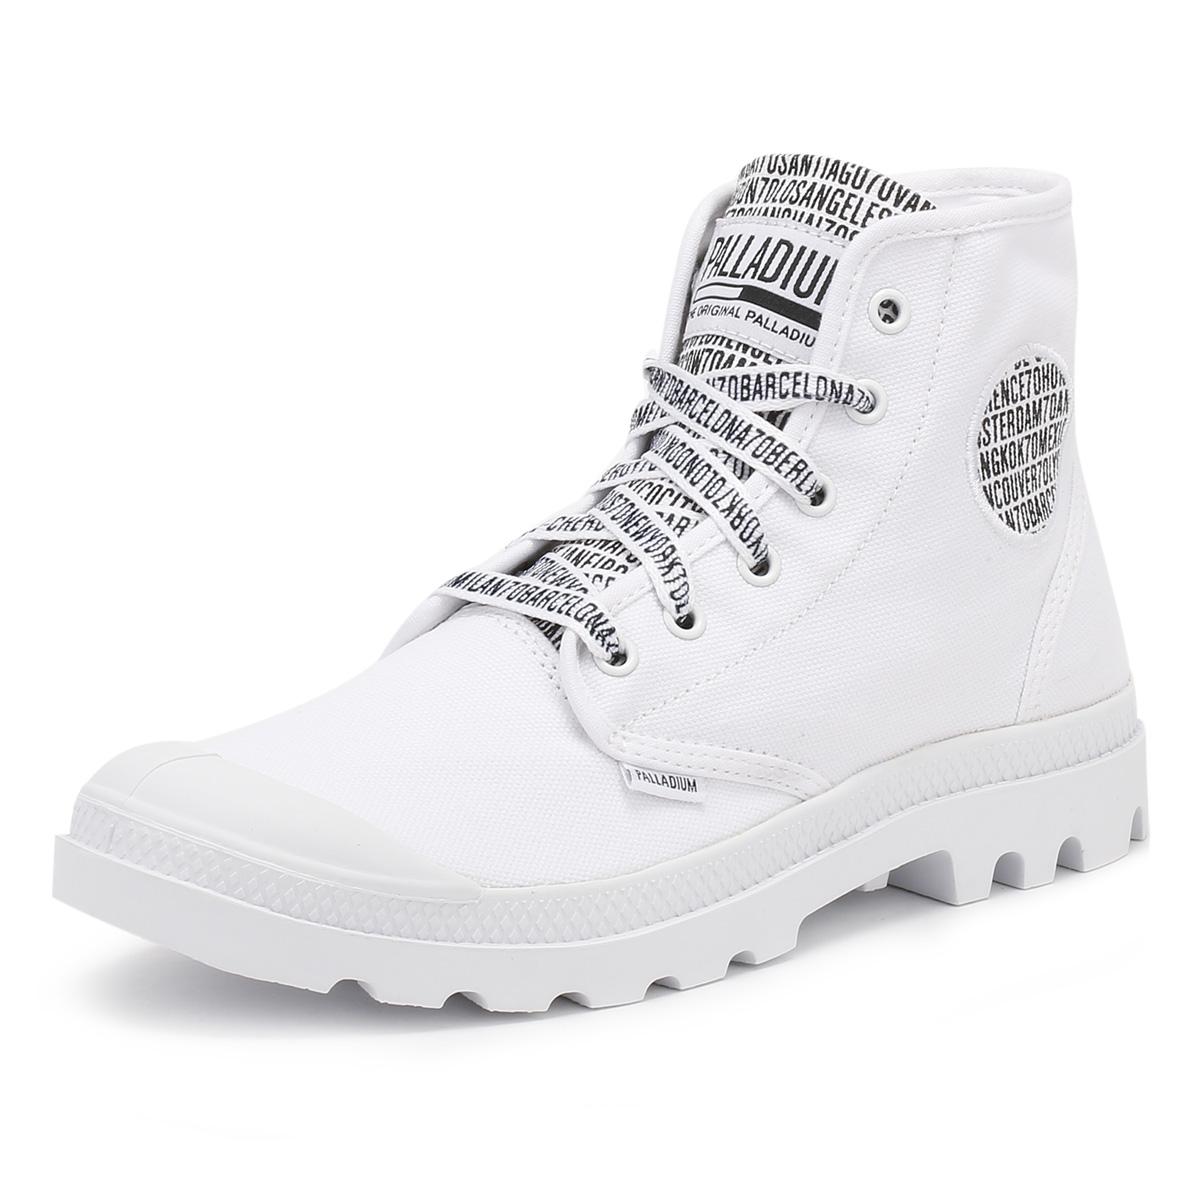 palladium pa hi 70th anniversary ankle boots black or